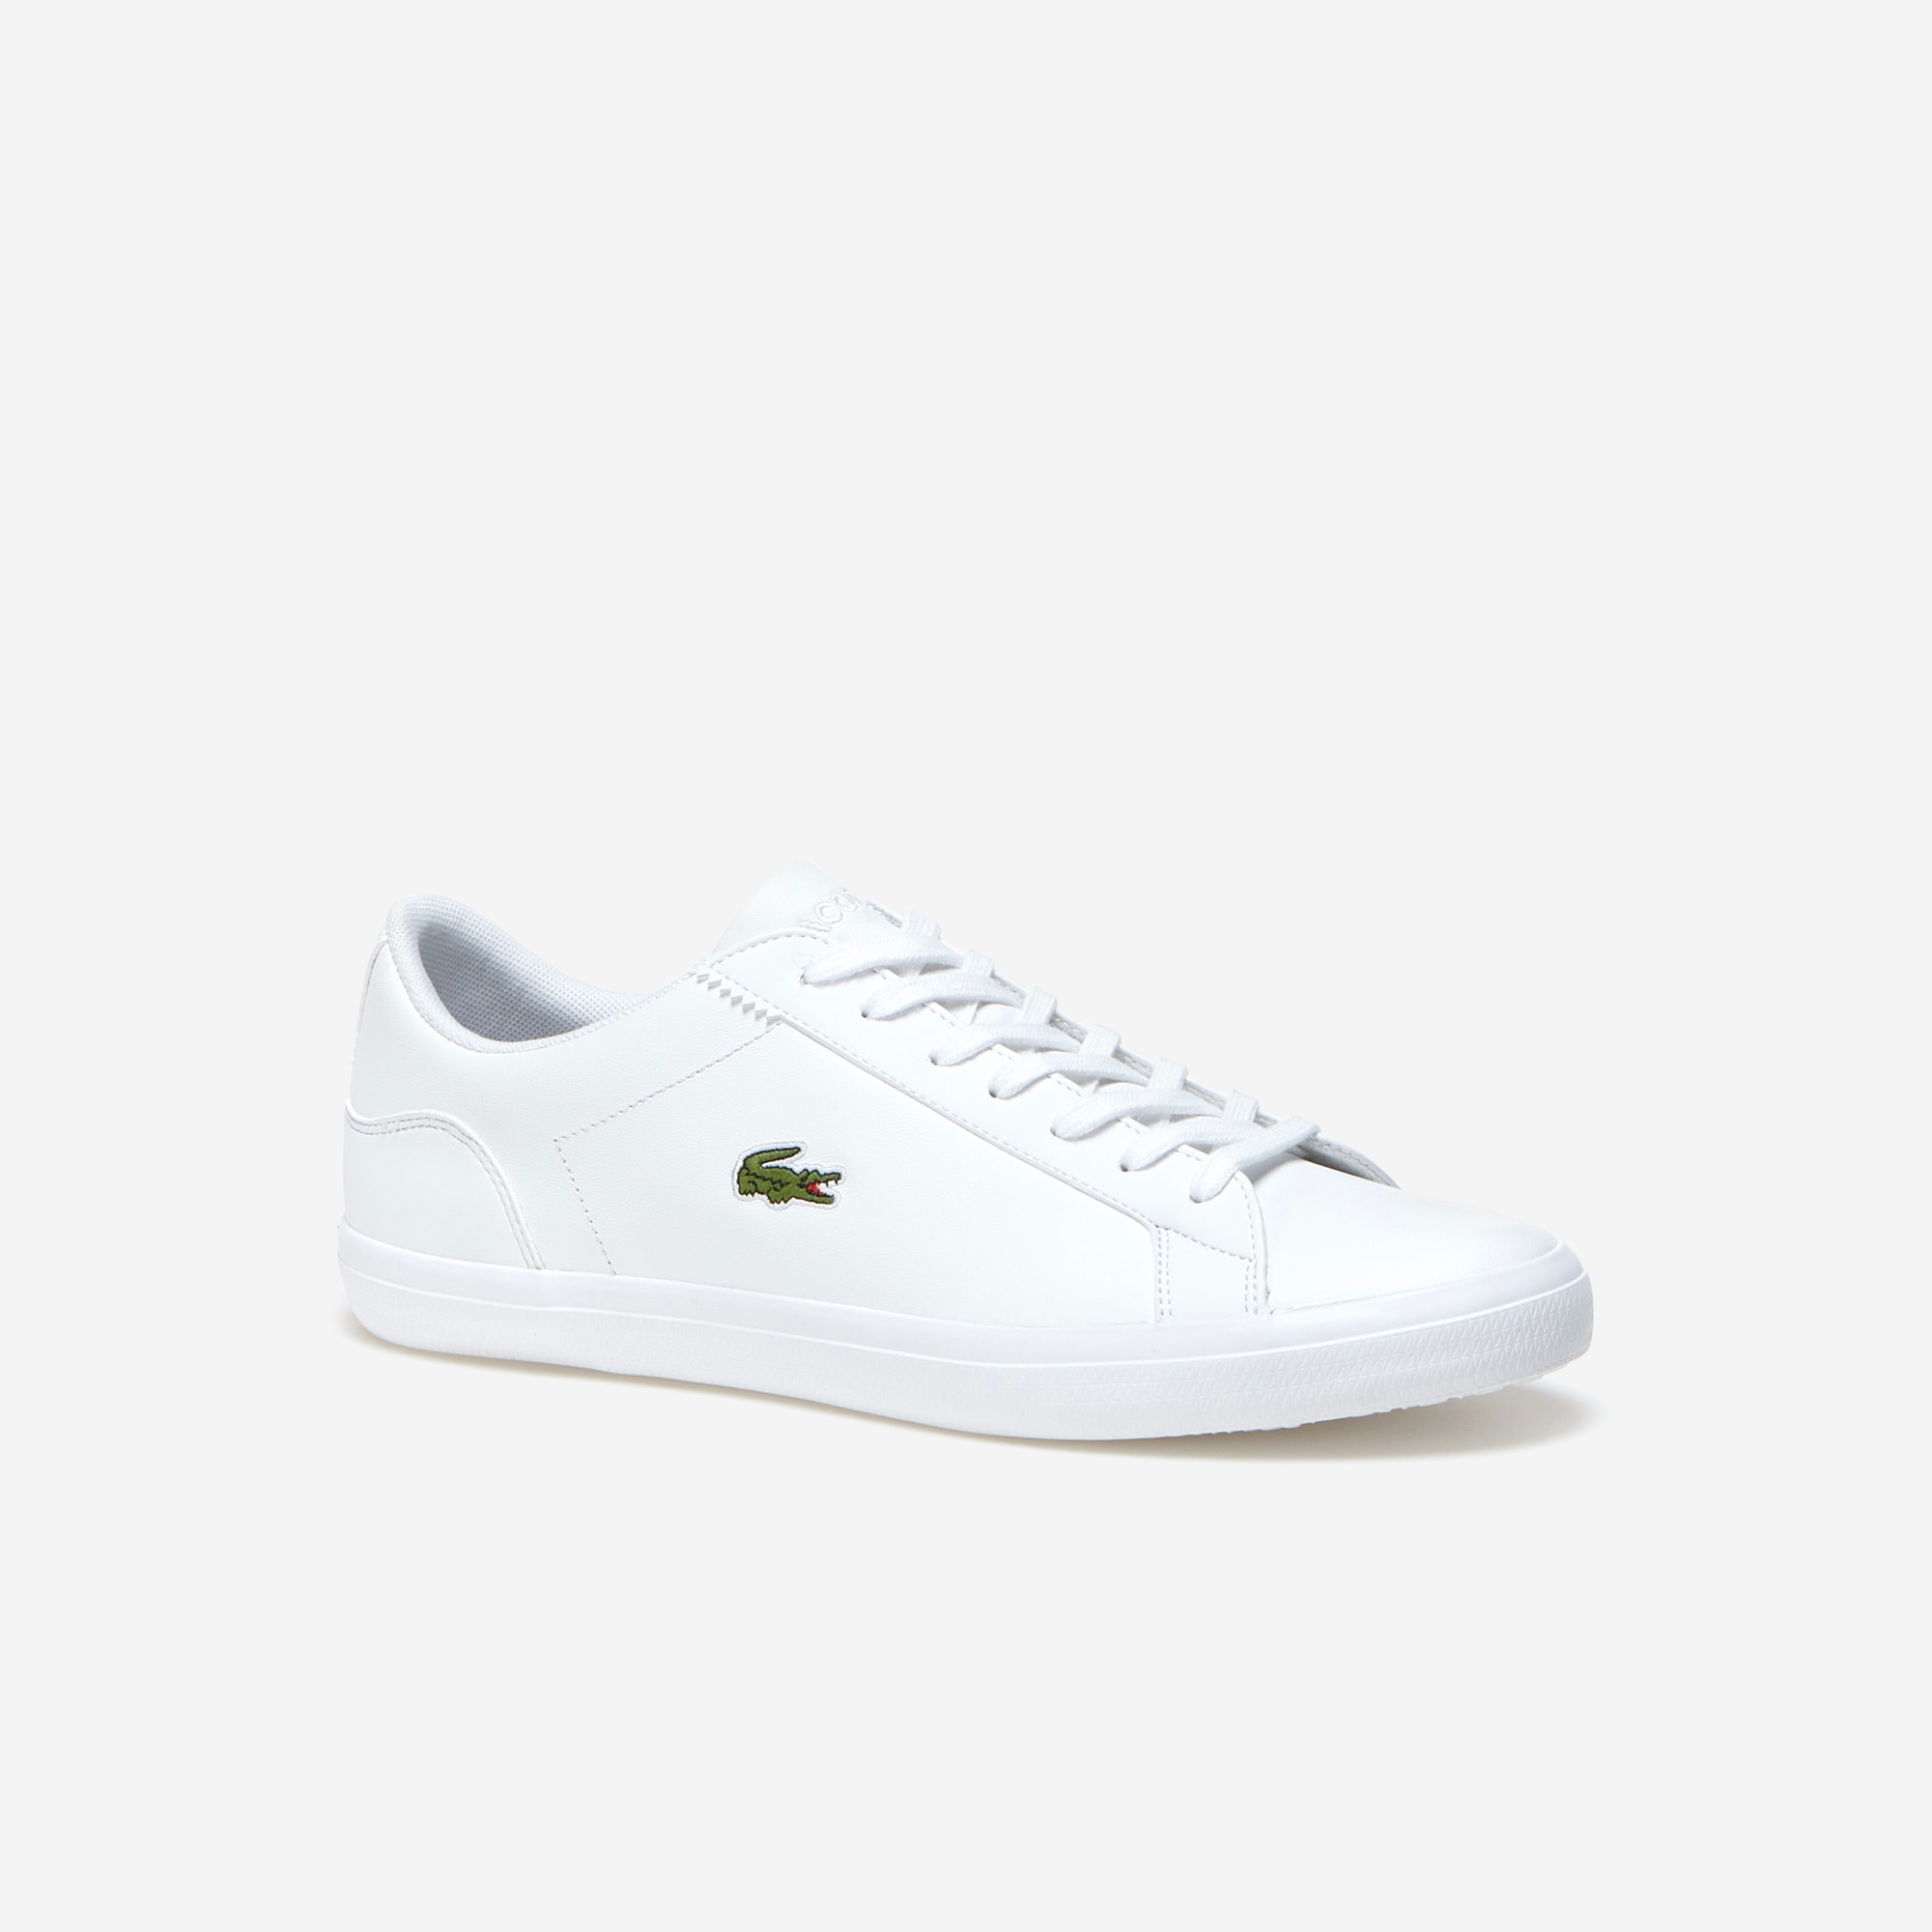 baf7a310e Men s Shoes